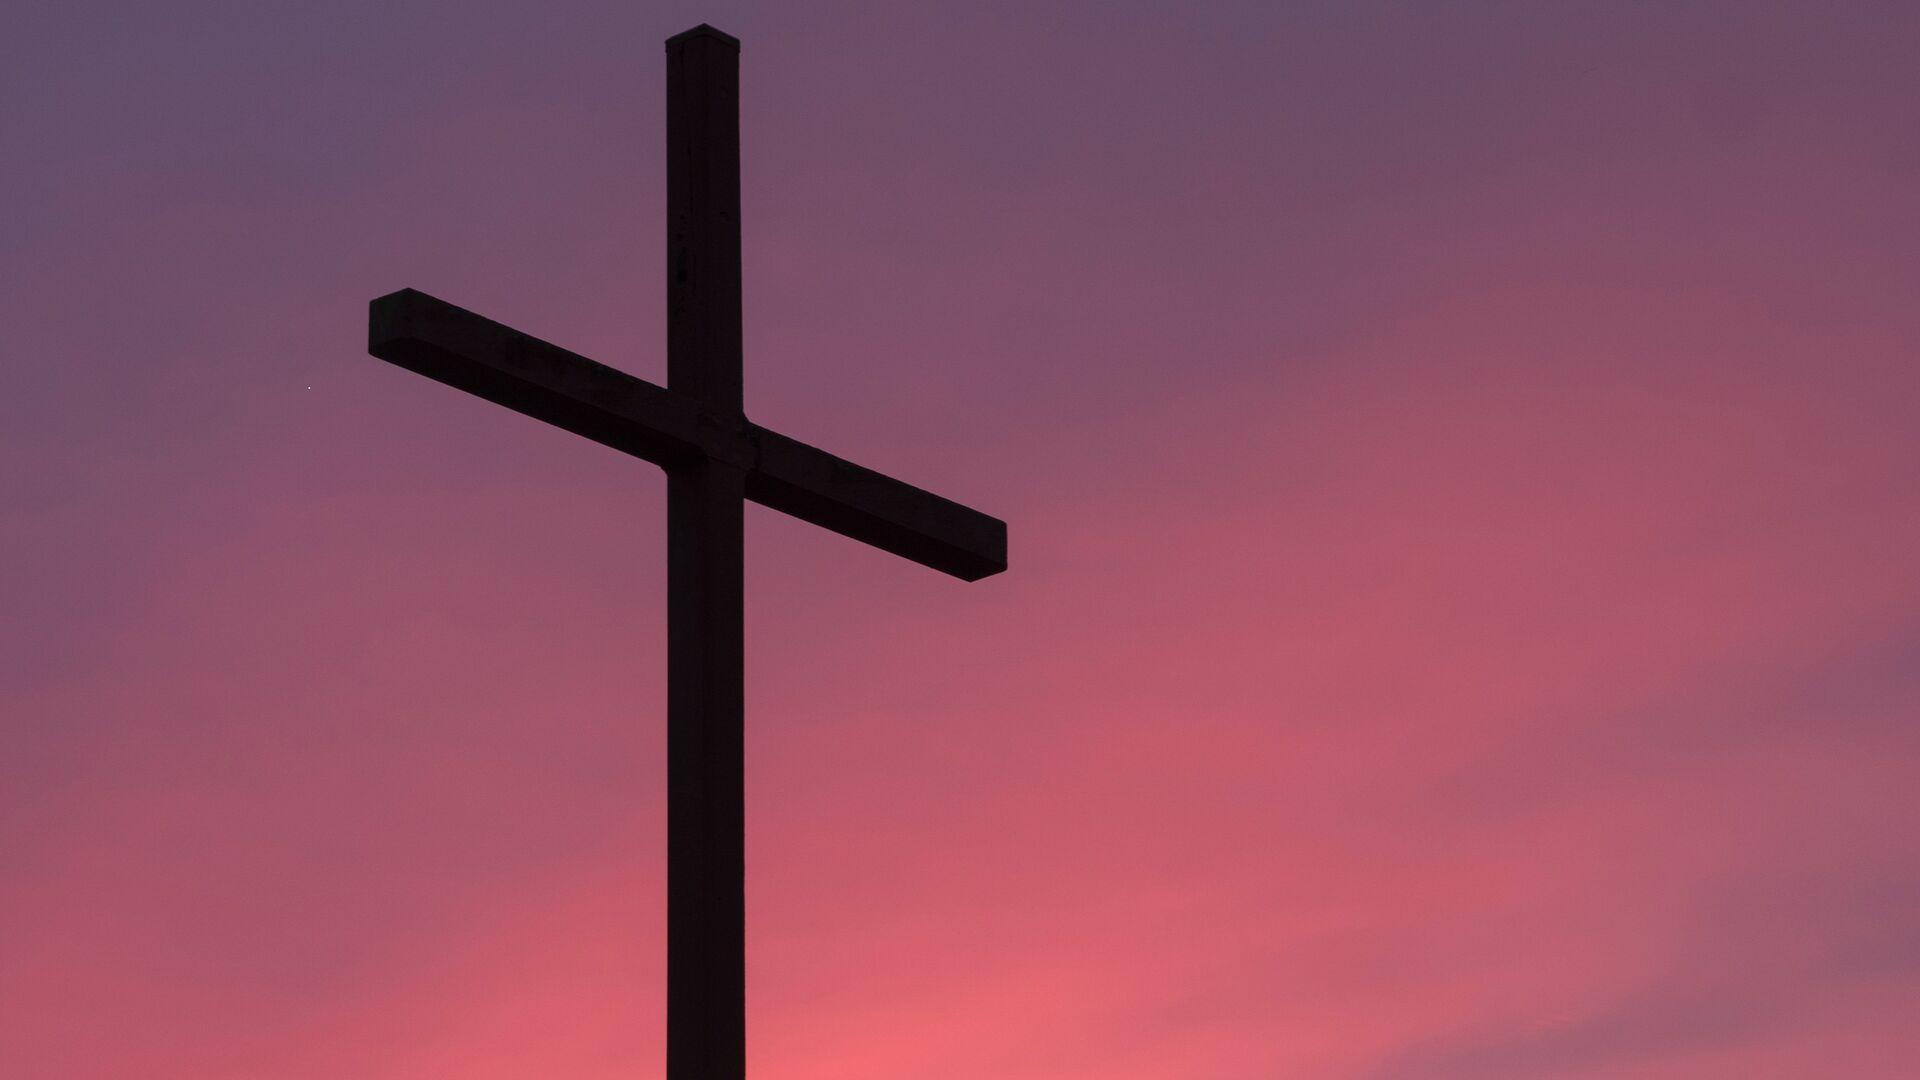 Una cruz (imagen referencial) - Sputnik Mundo, 1920, 22.09.2020